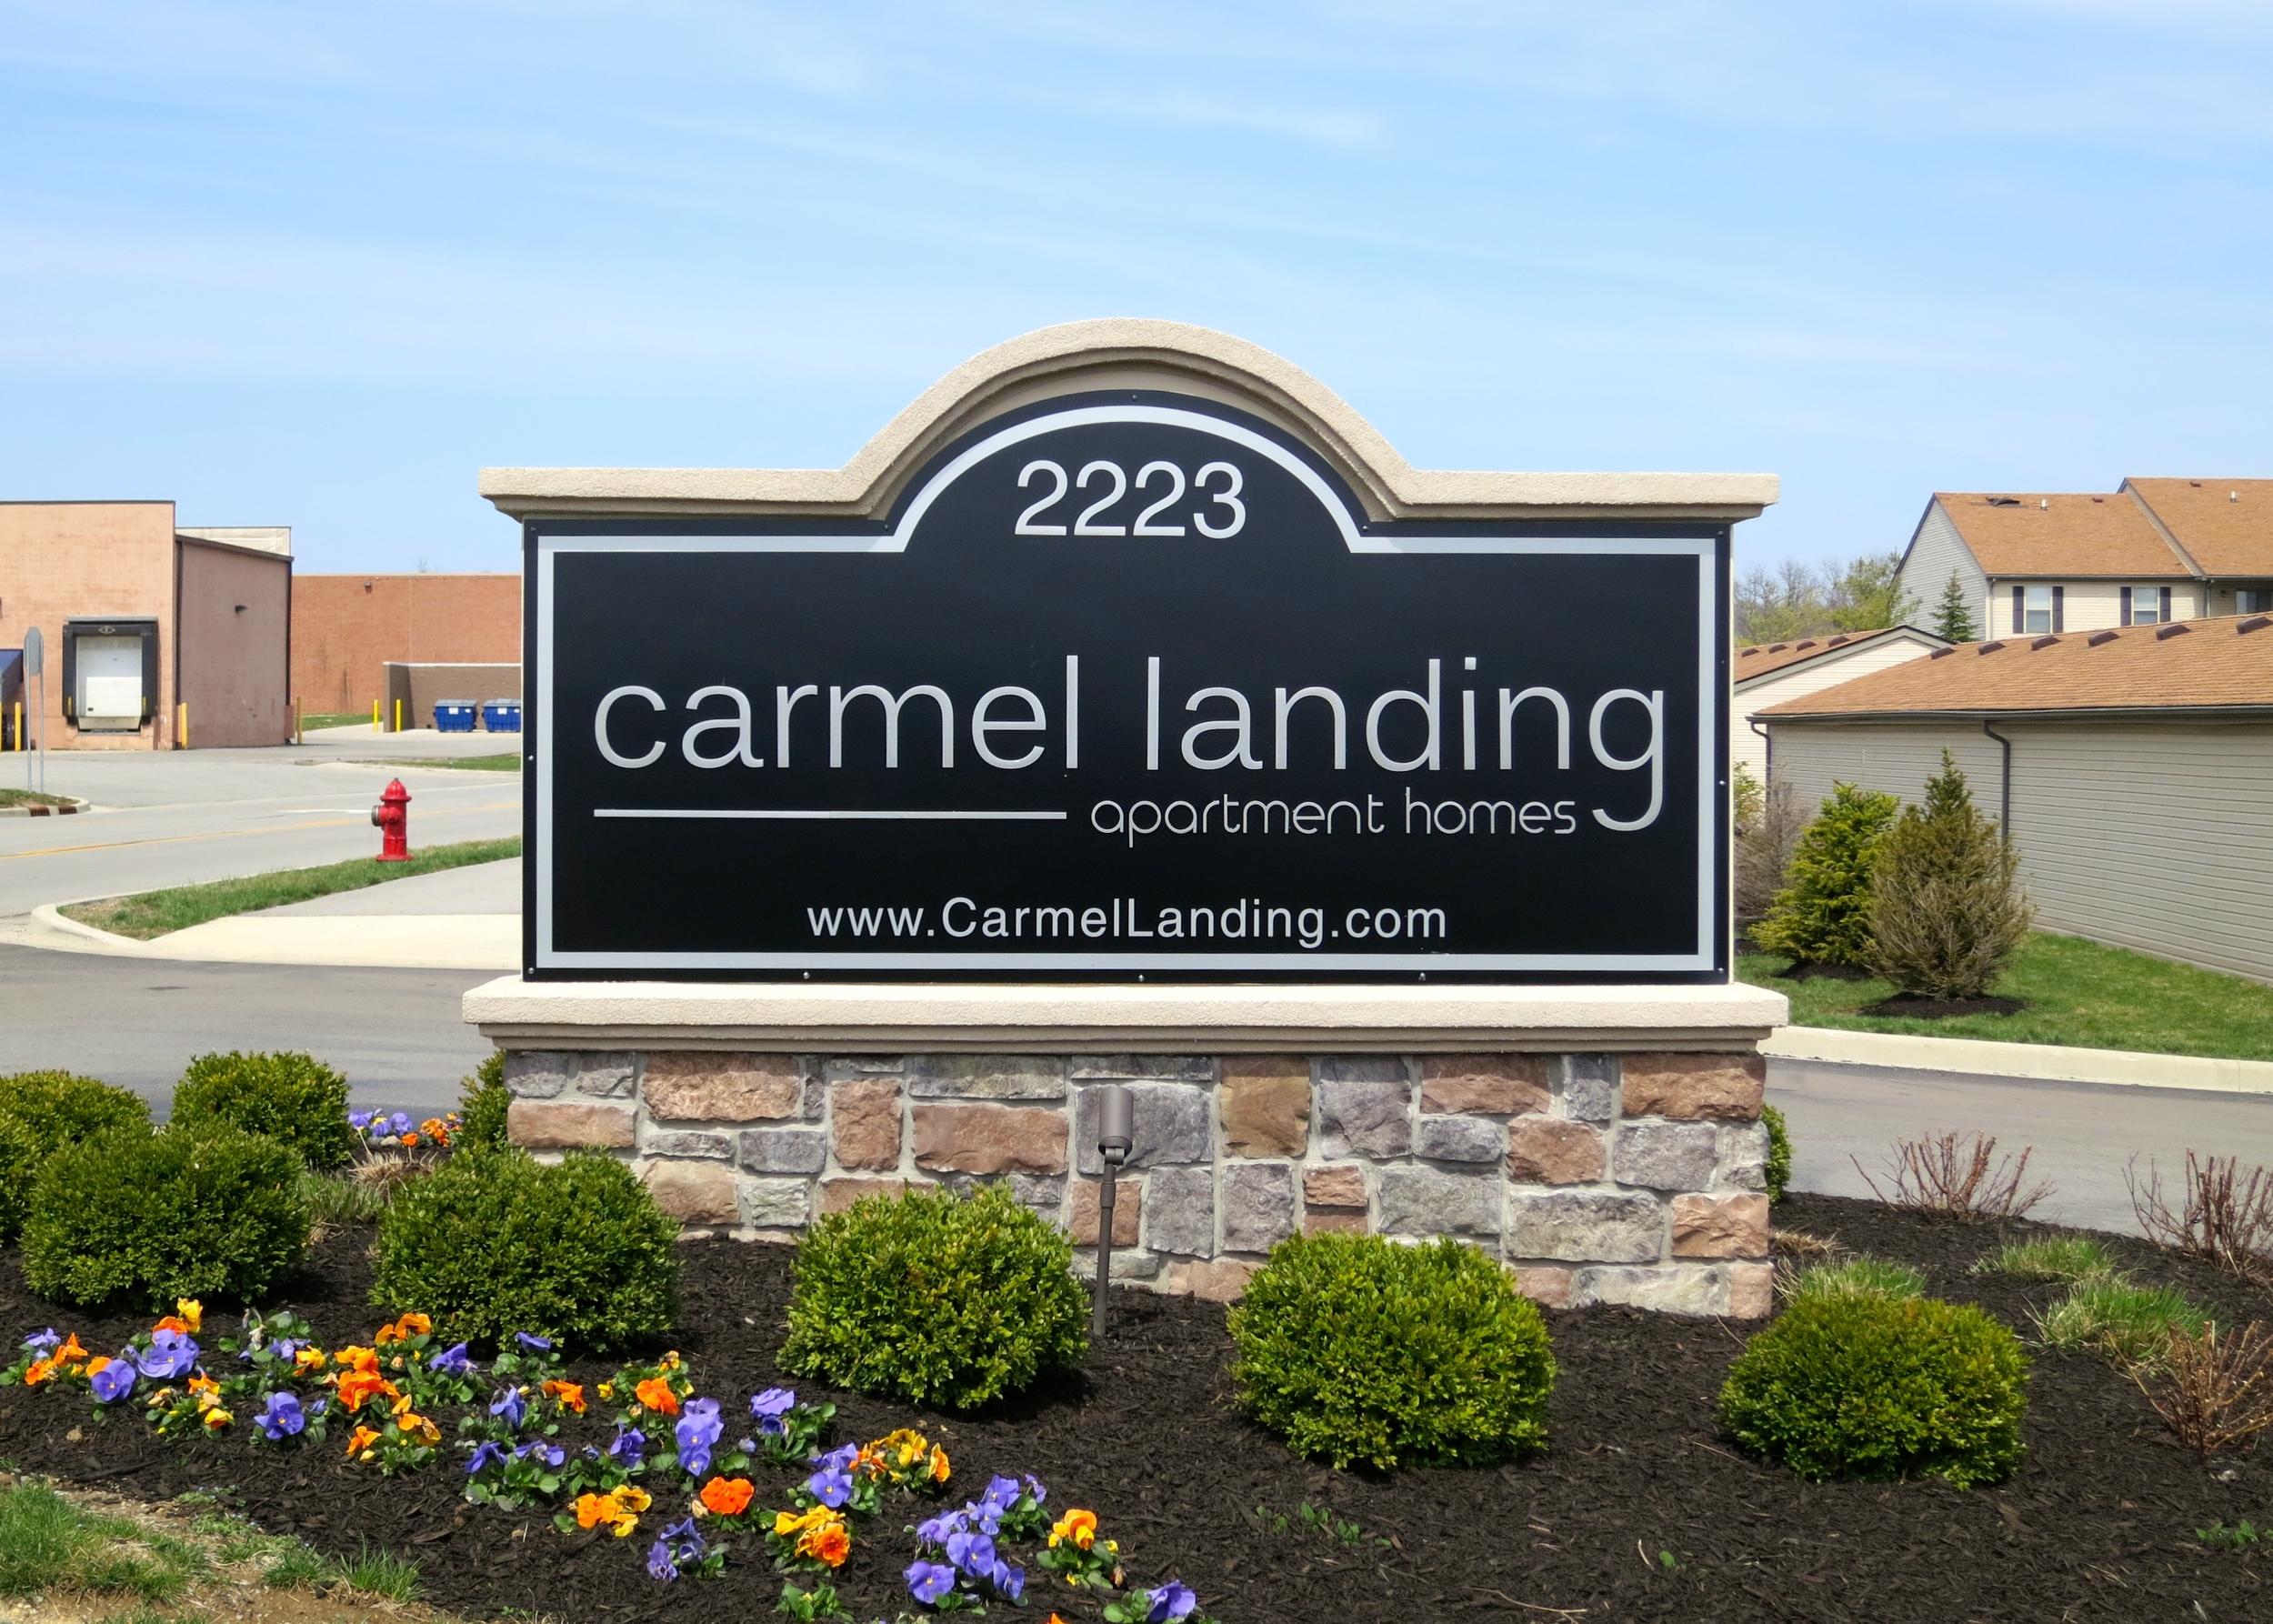 Monument Sign for Carmel Landing Apartment Homes